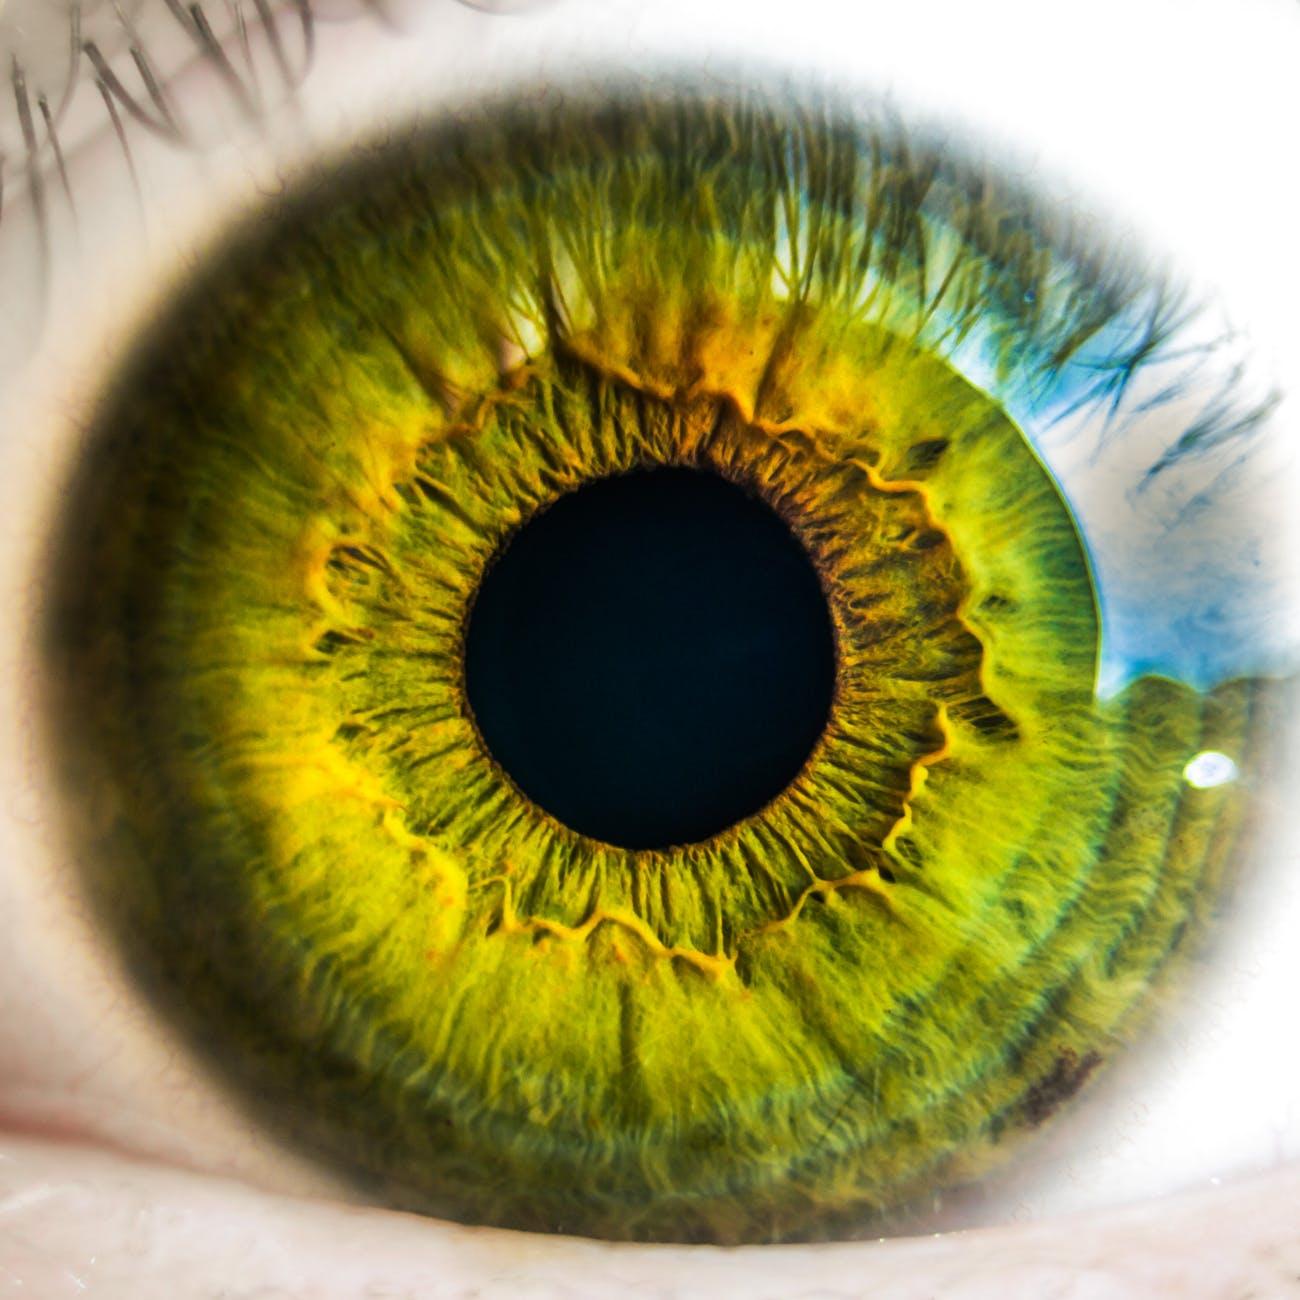 eye iris anatomy biology